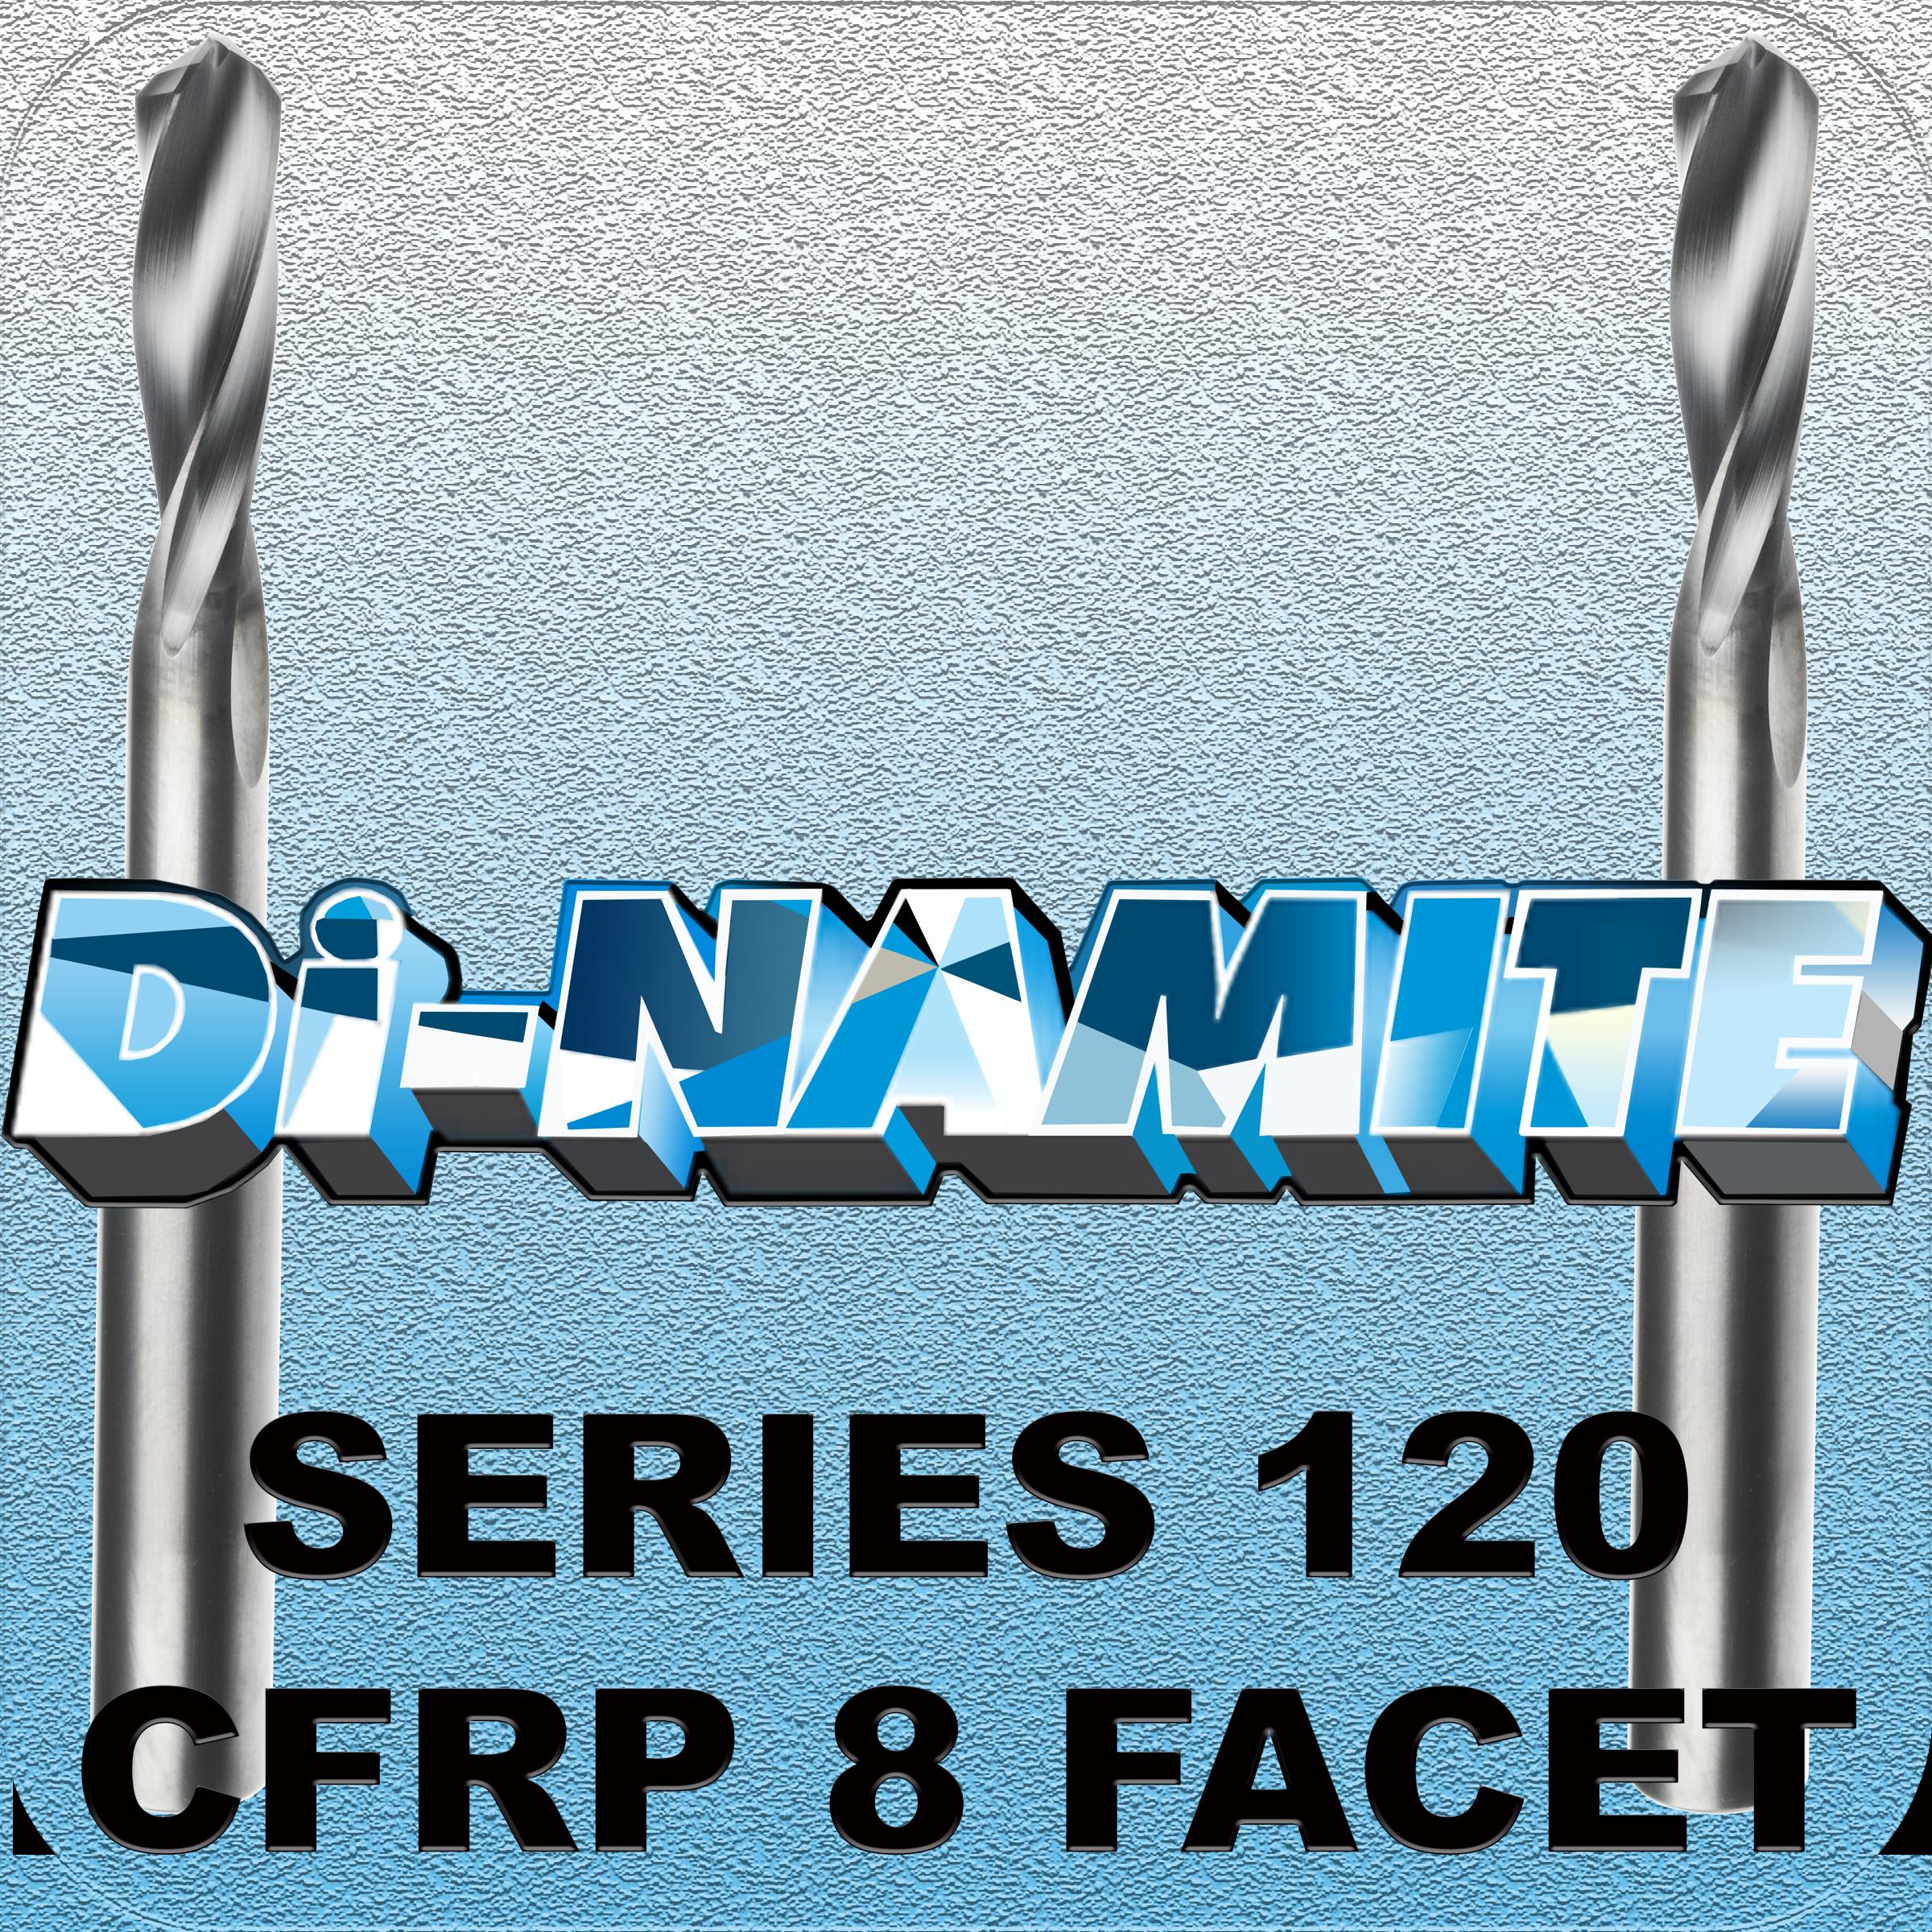 CFRP 8 Facet | Series 120